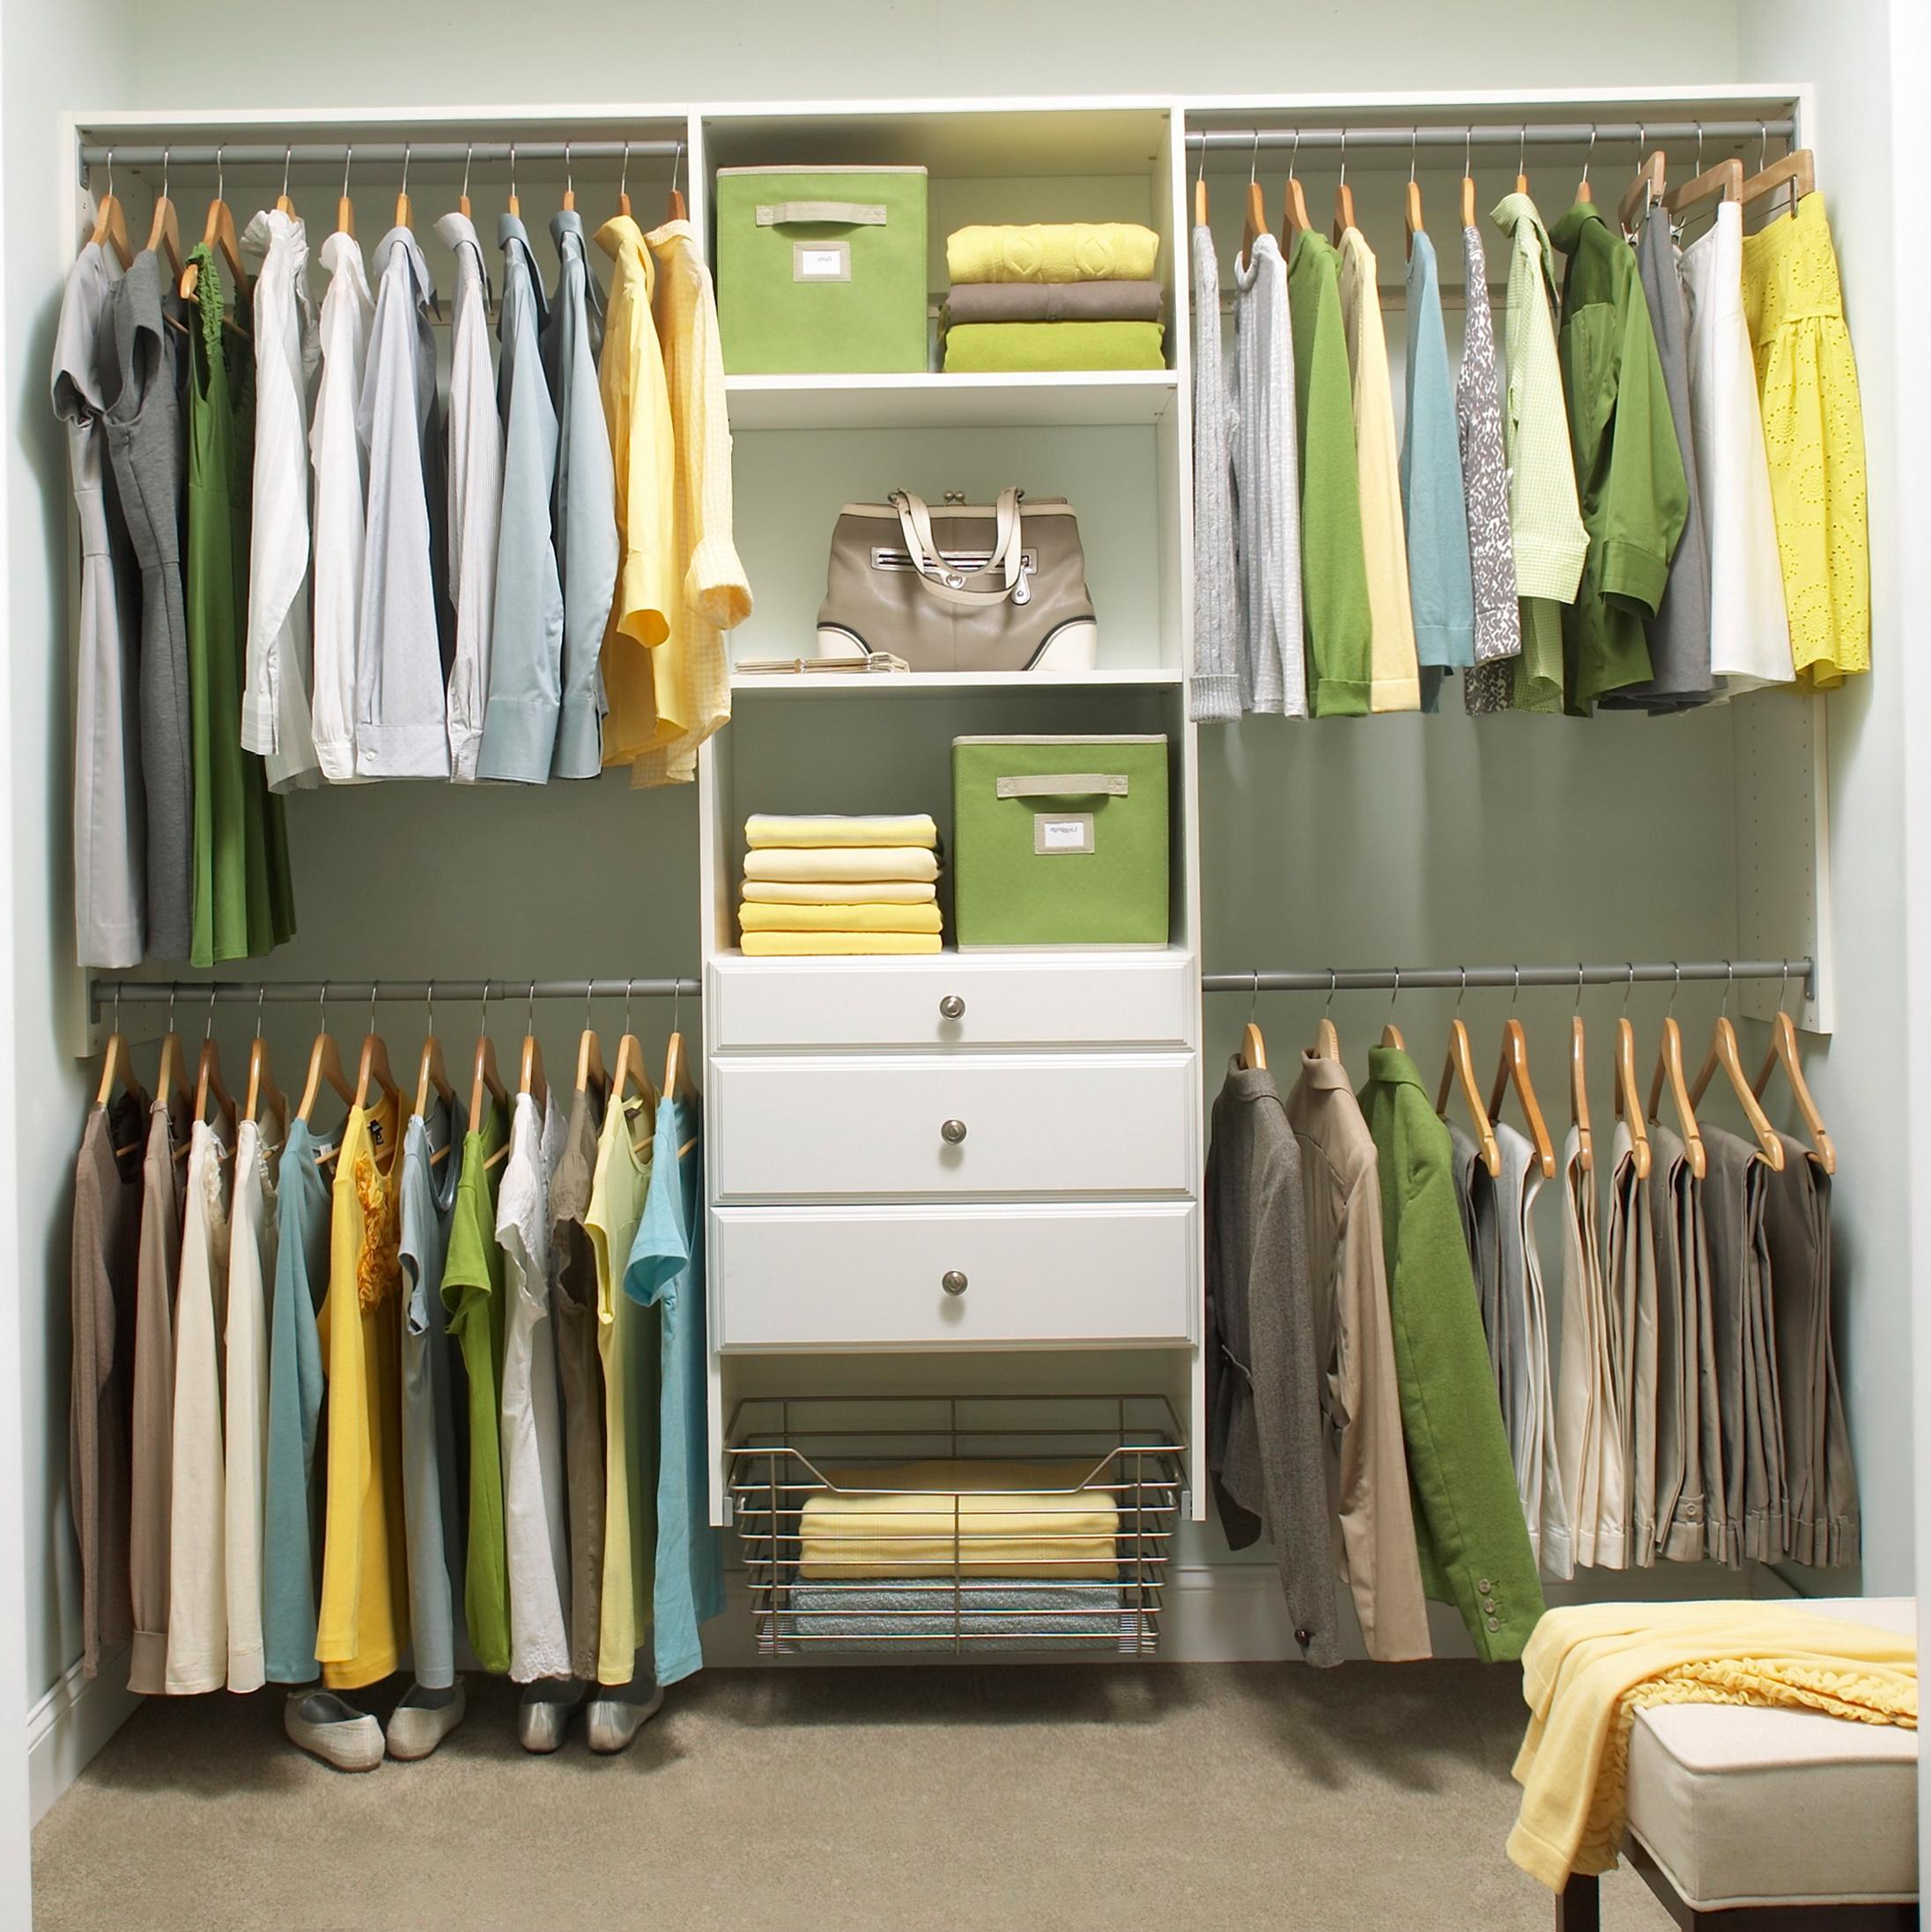 Martha Stewart Living Closet : Martha Stewart Living Closet Organizer  Home Design Ideas